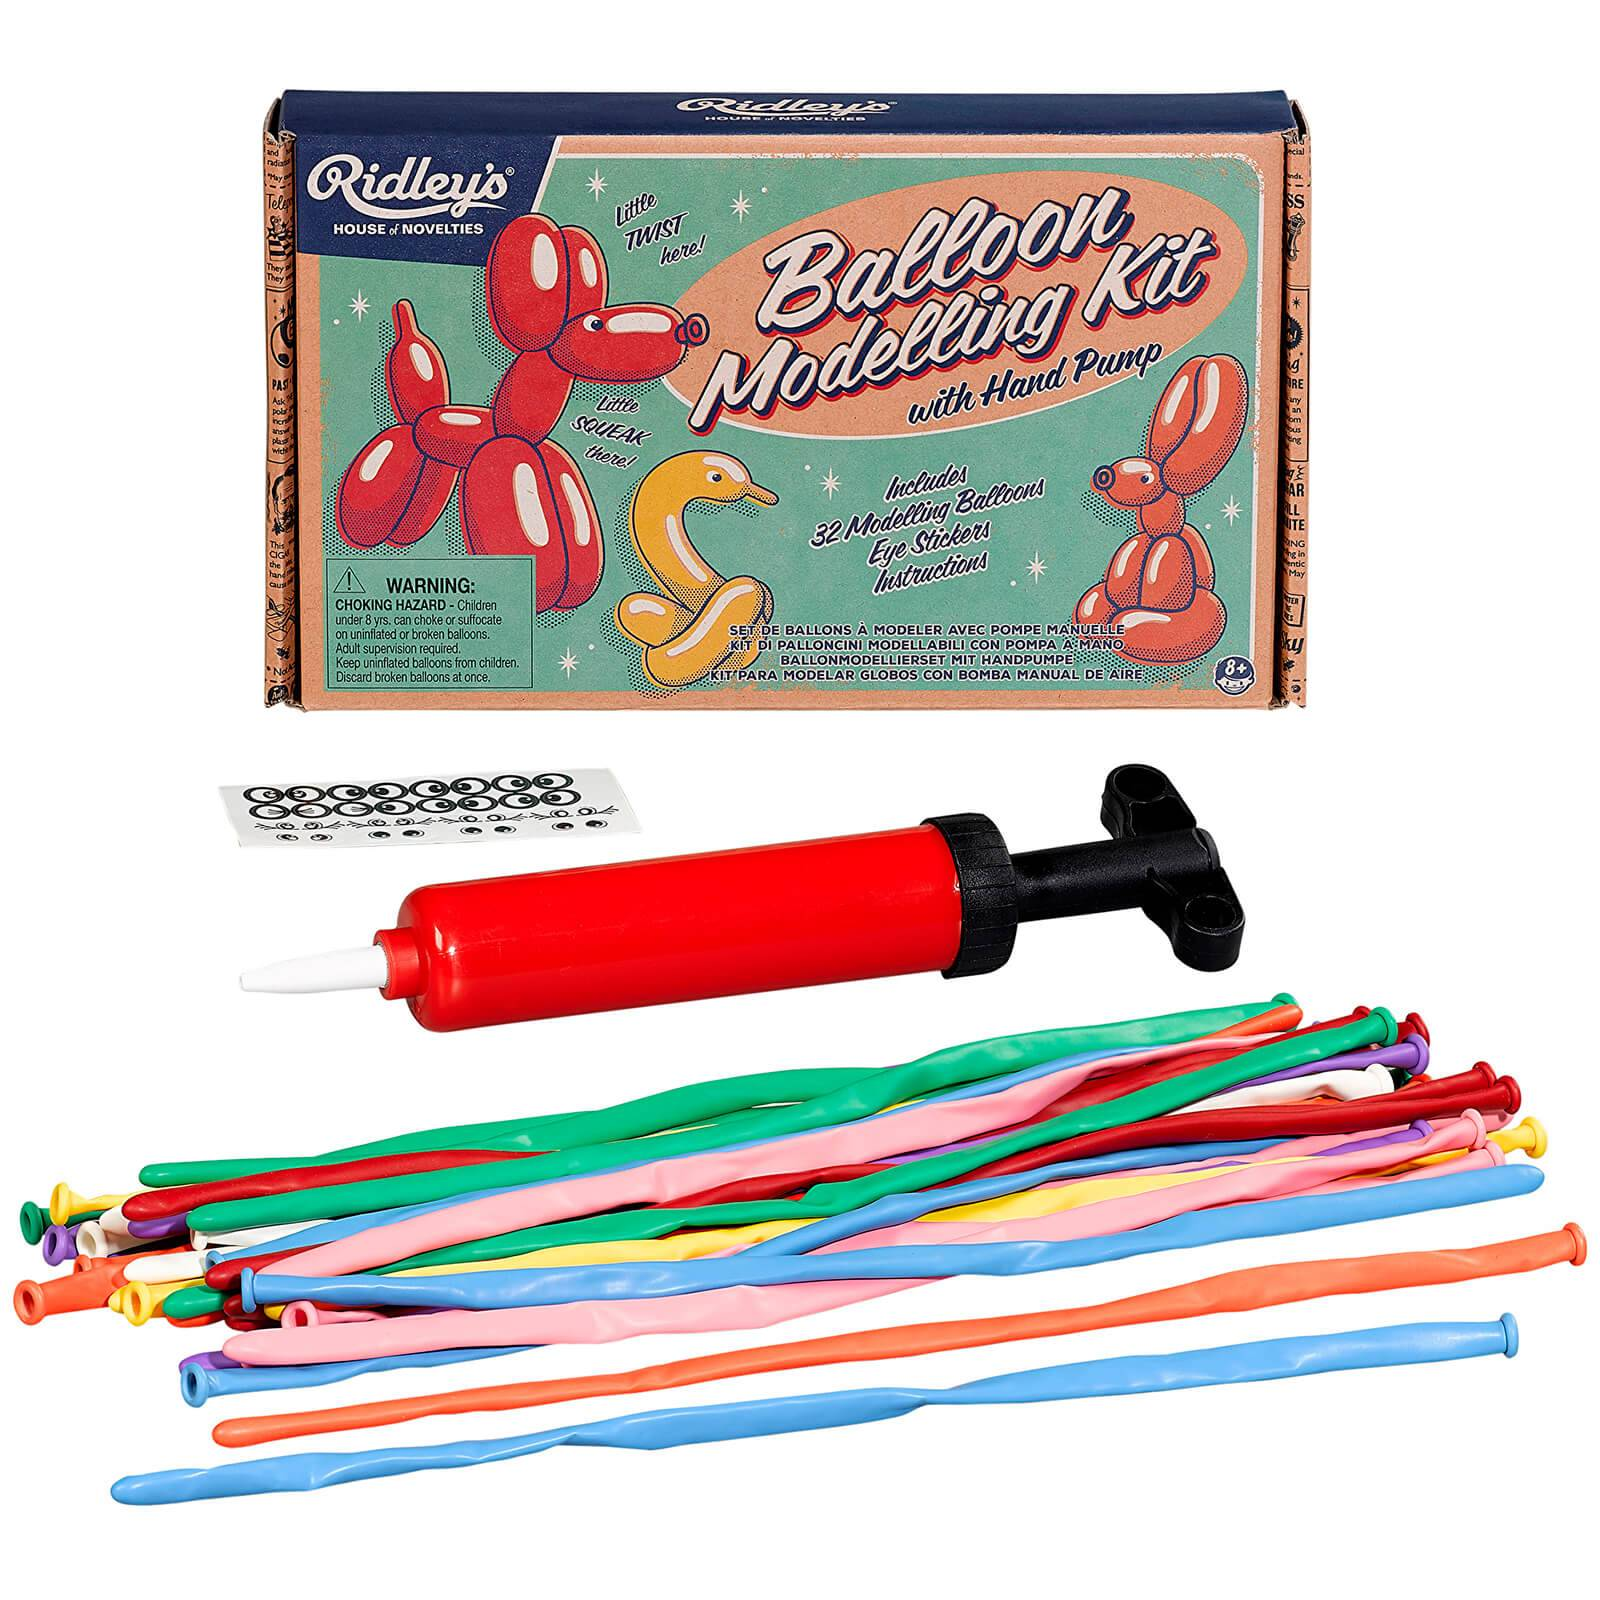 Ridley's Balloon Modelling Kit